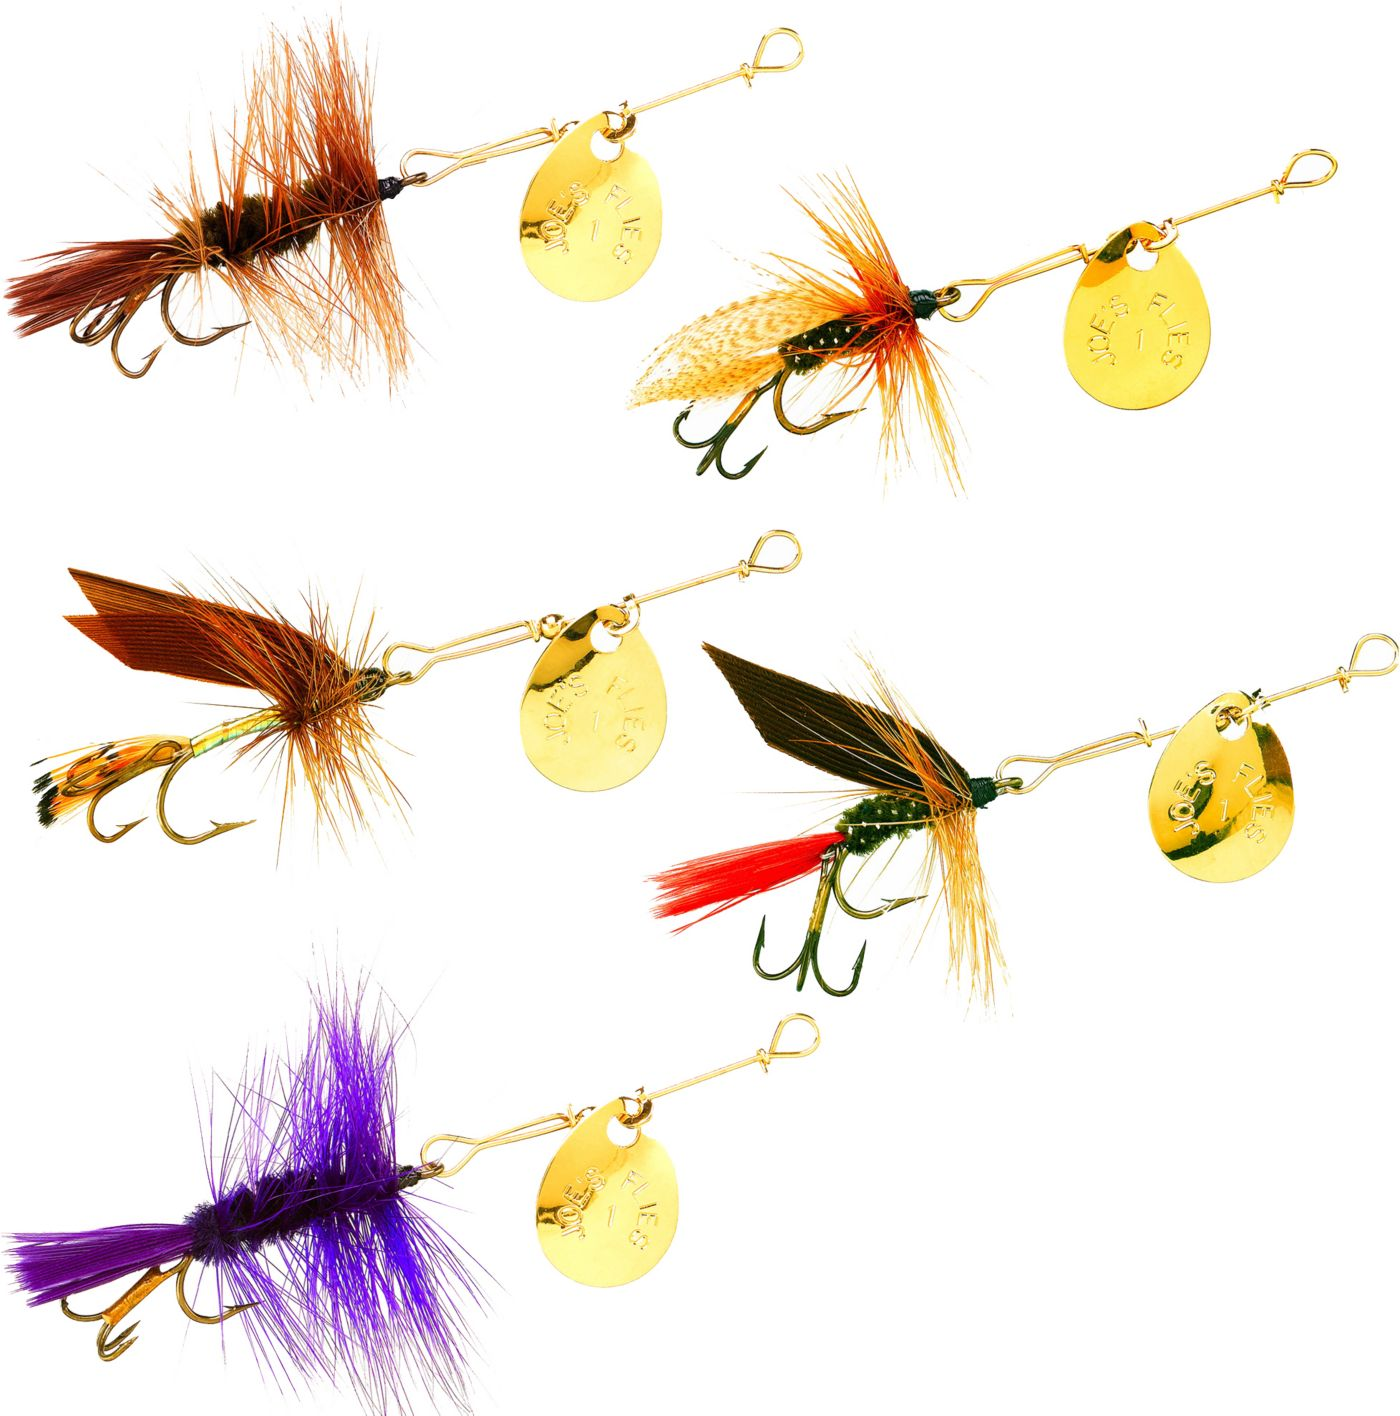 Joe's Flies Hot 4 Trout 5-Pack Lures